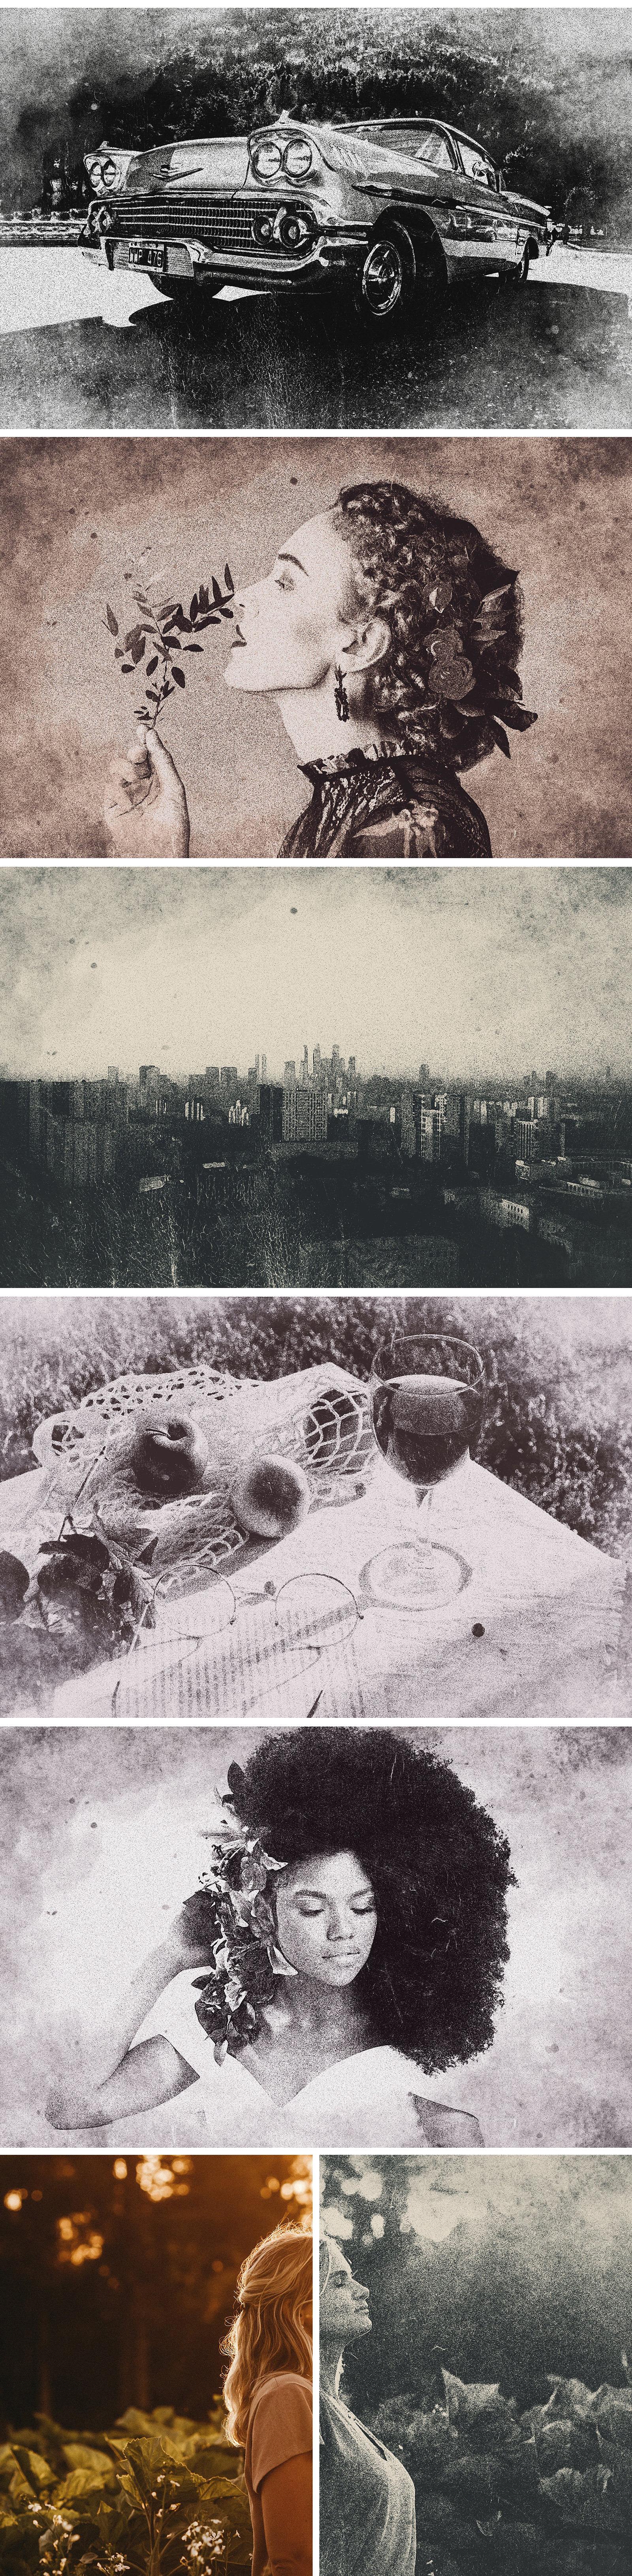 Vintage Risograph Photo Effect